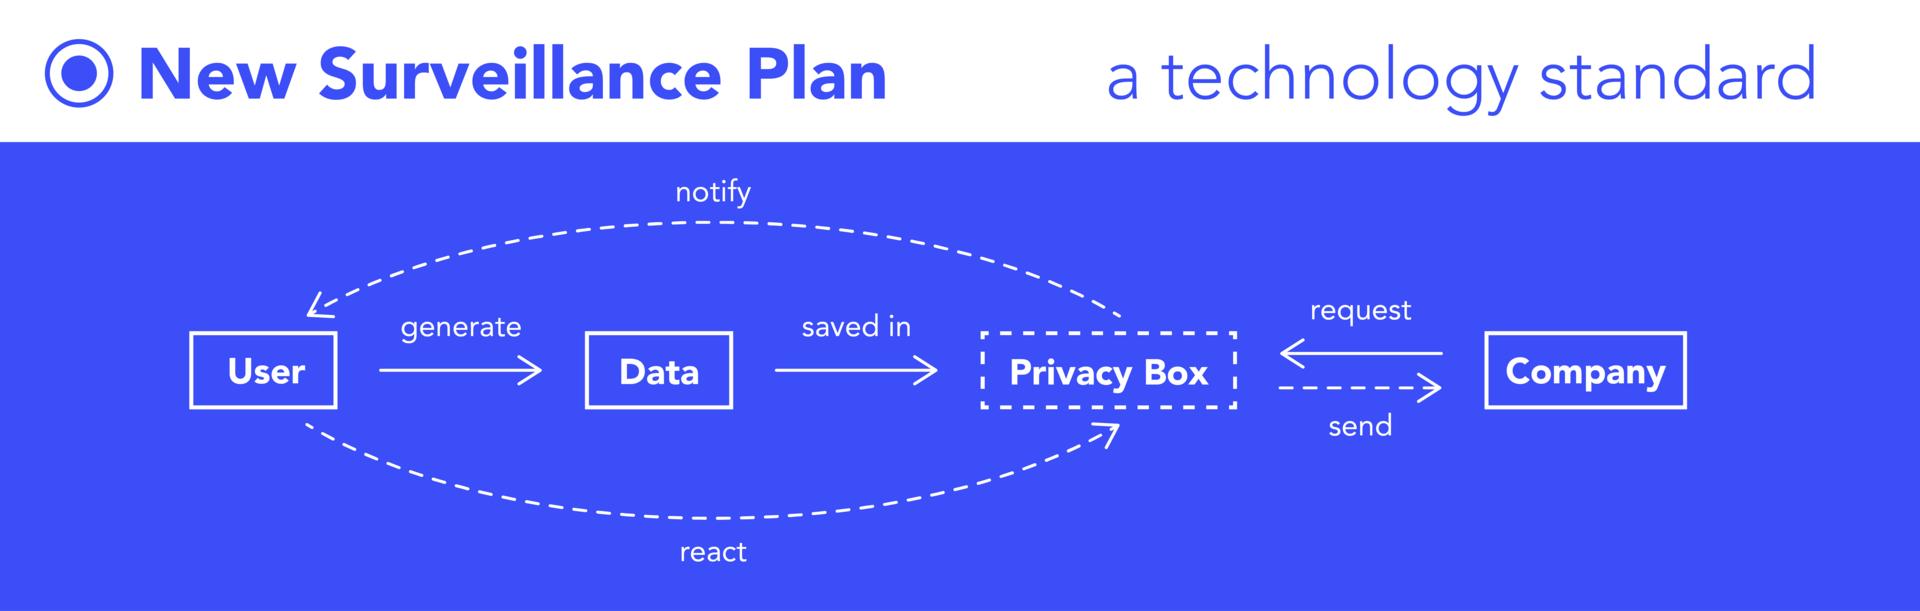 New Surveillance Plan